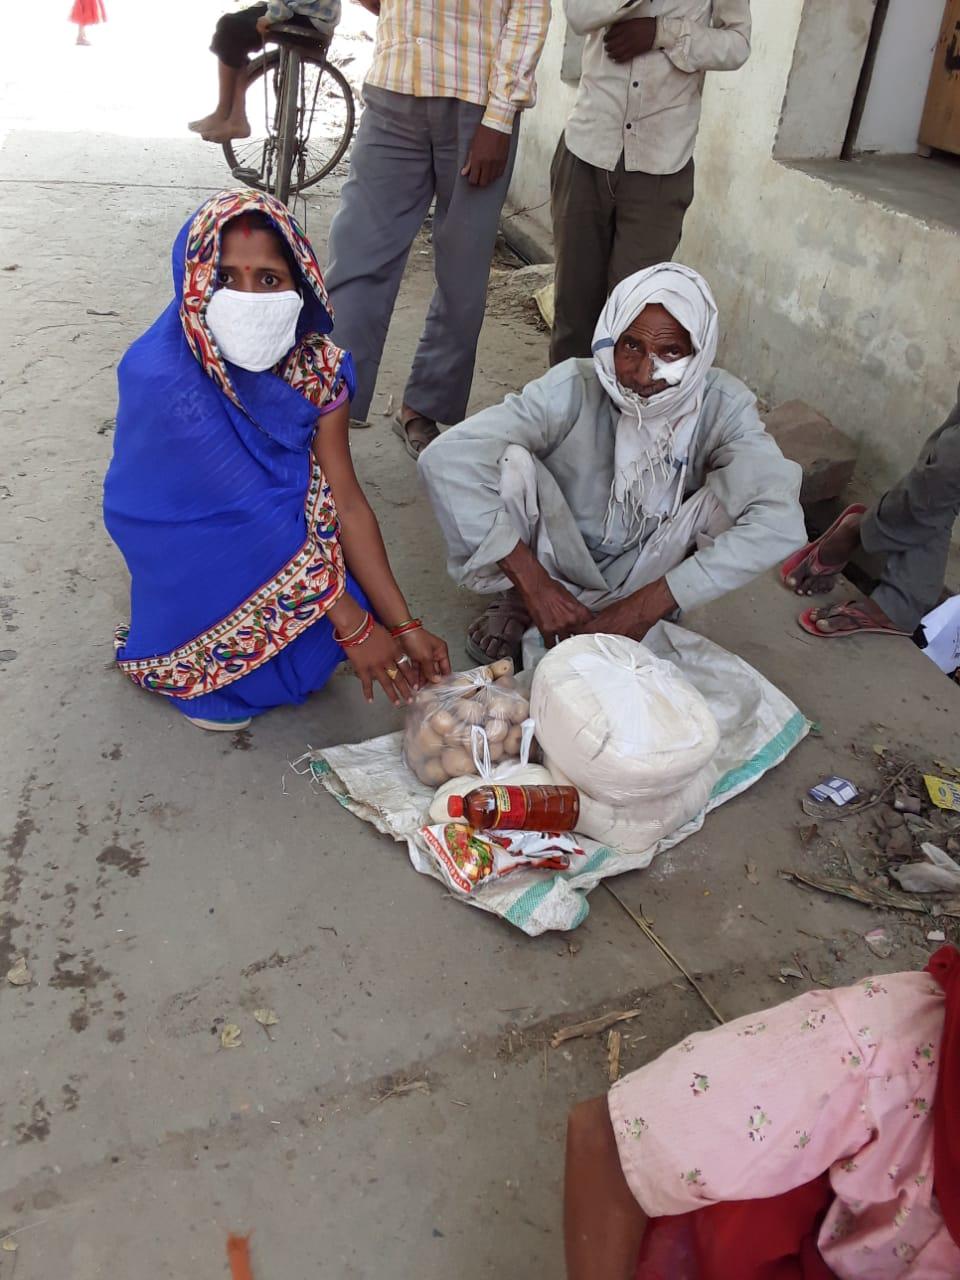 You are currently viewing Ration Distribution at Badaun, Uttar Pradesh